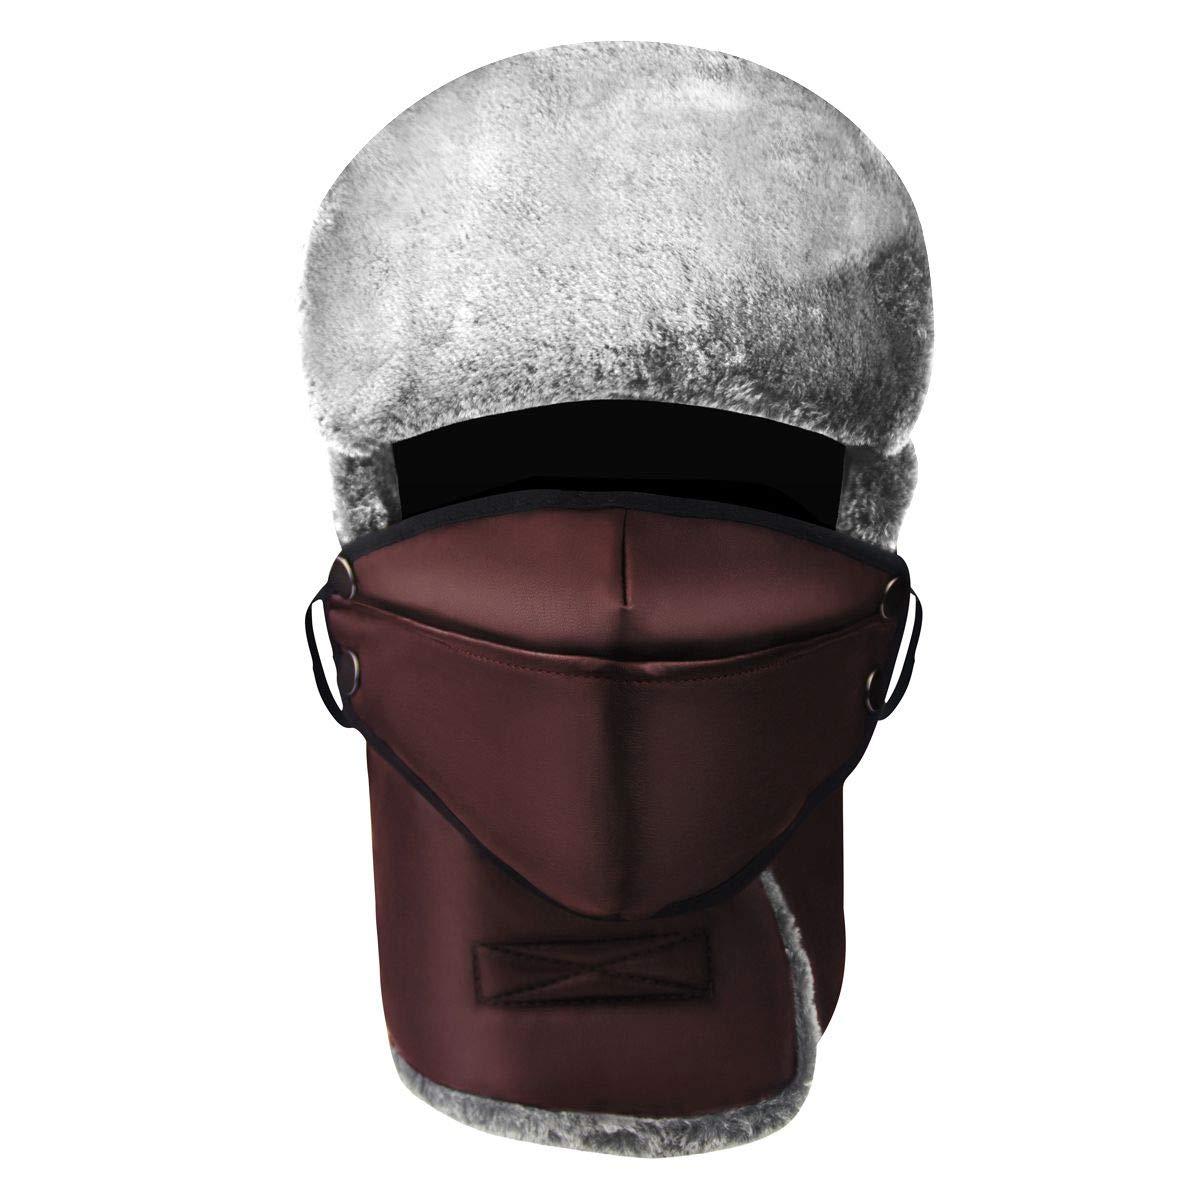 bd24b762260 Winter trapper fur hat men women warm leather ushanka jpg 1200x1200 Leather  hat with ear flaps